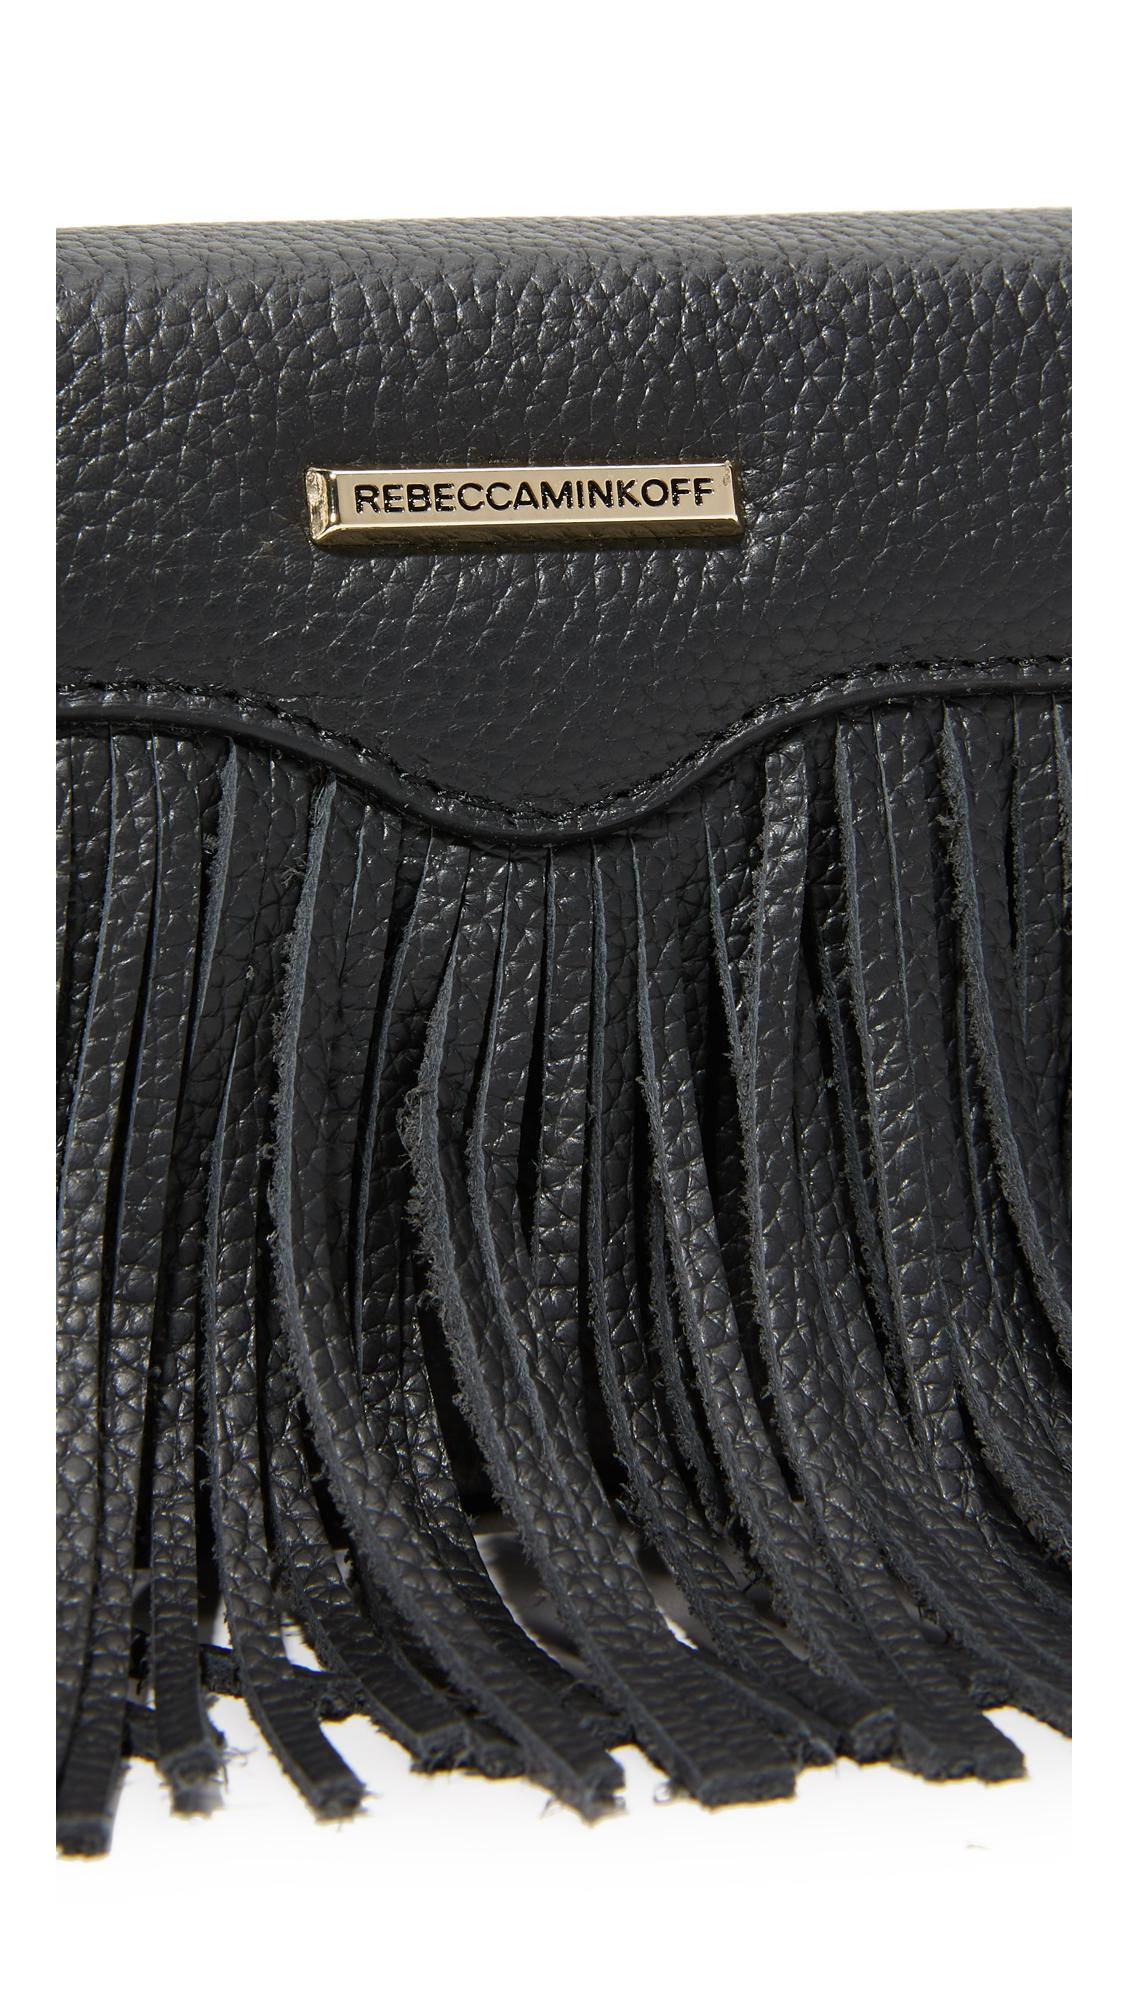 Rebecca Minkoff Leather Fringe Tech Cross Body Bag in Black